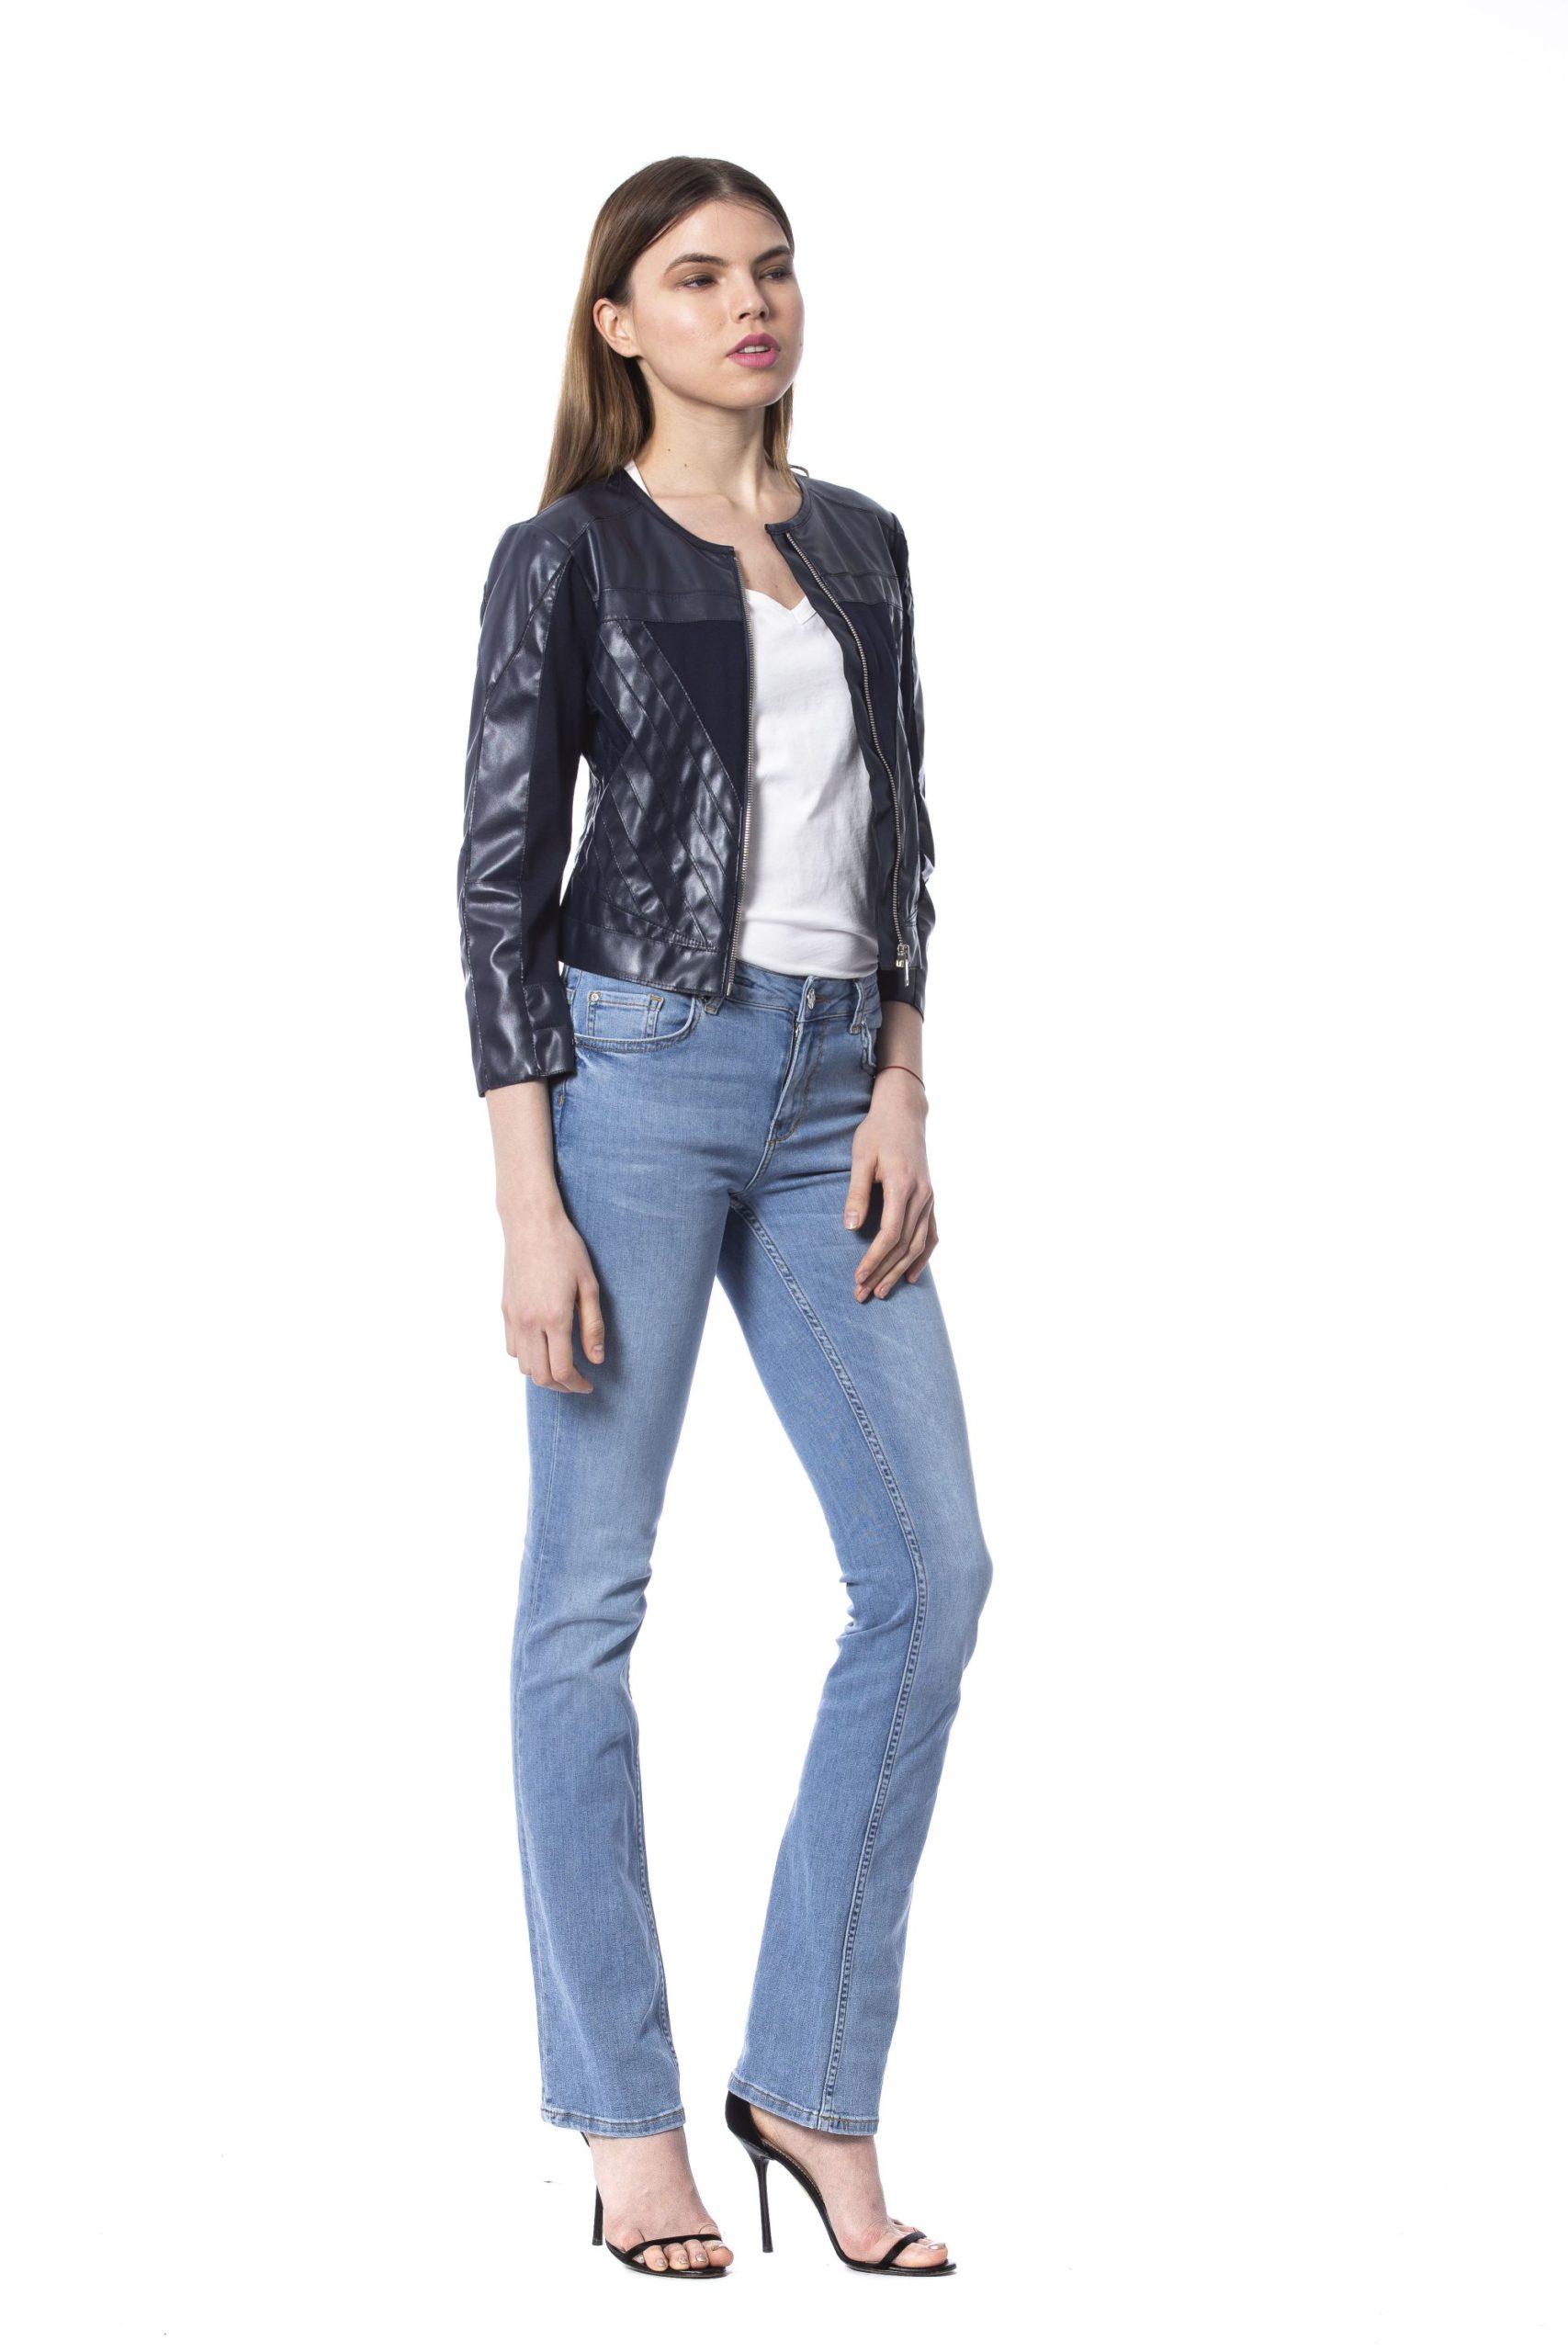 Silvian Heach Women's Jackets Blue SI993940 - XS